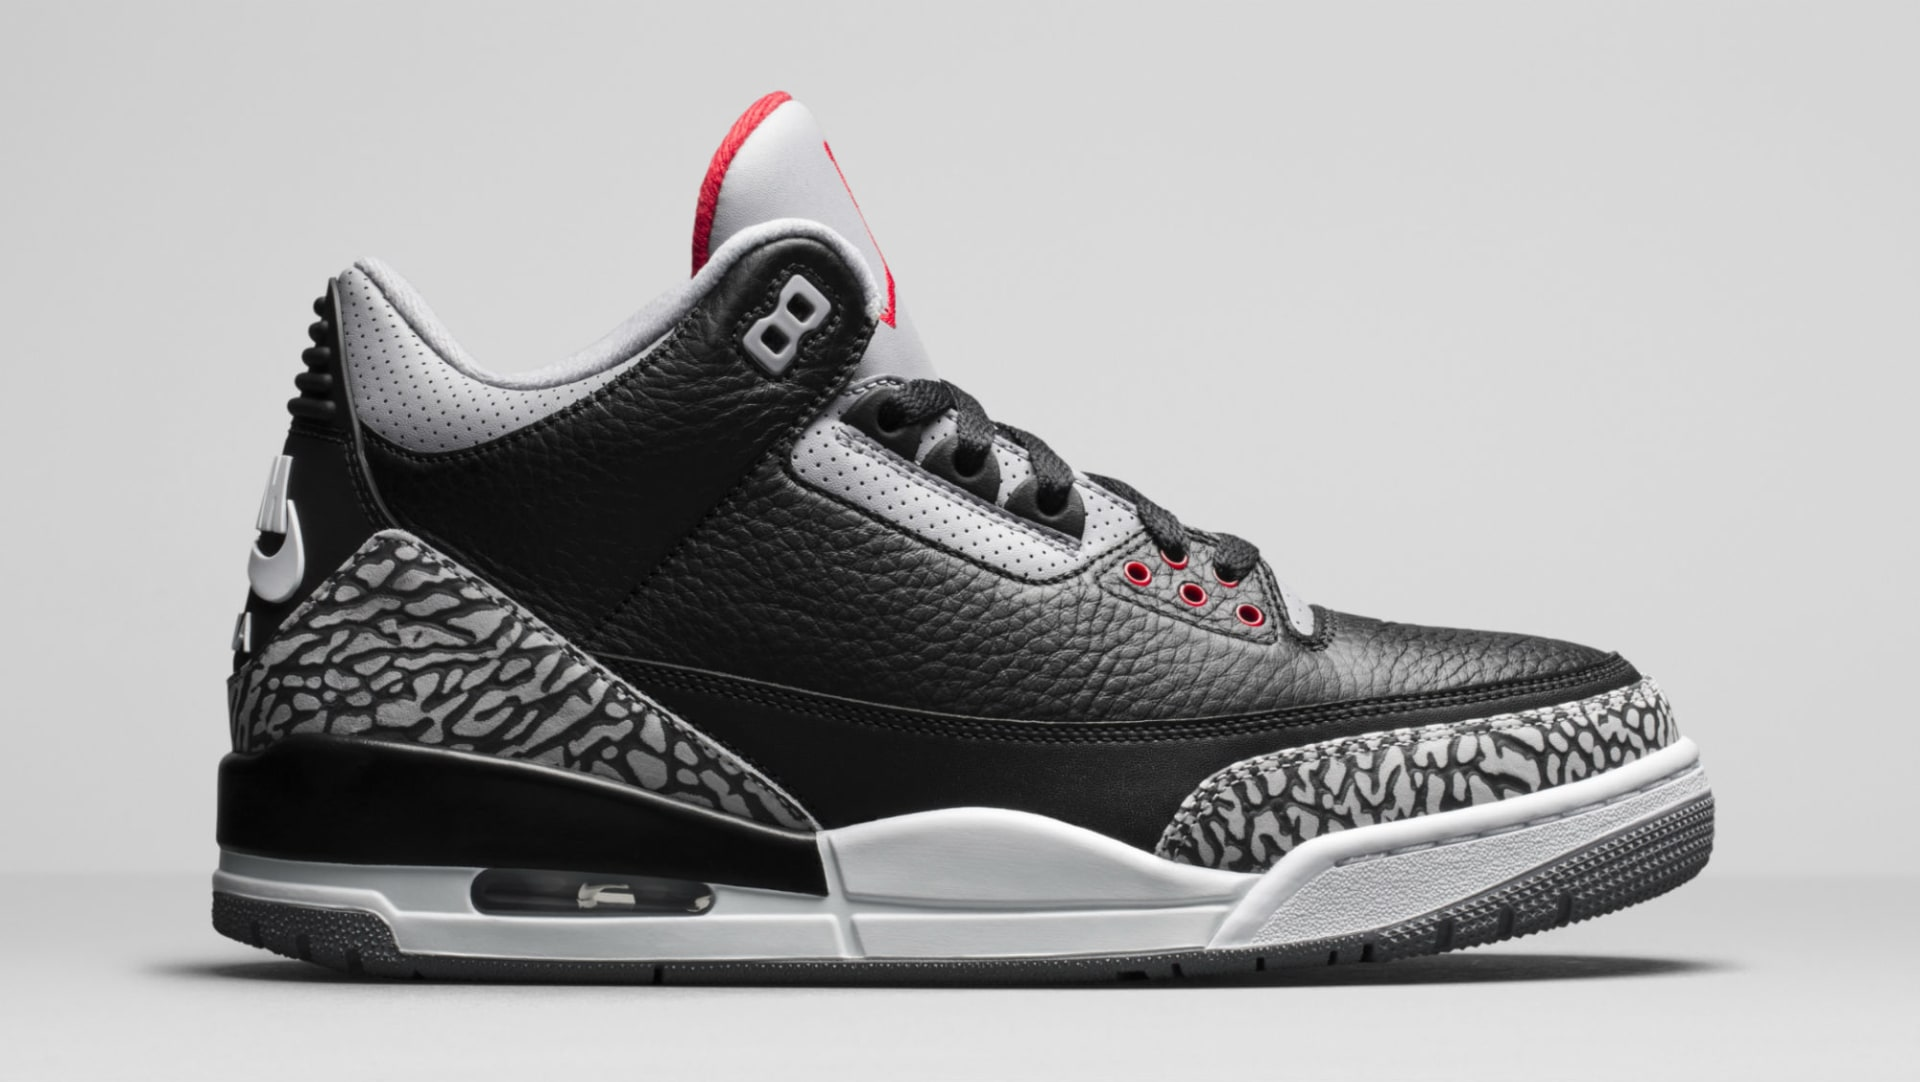 6f5fc8be8 Air Jordan 3 III Black Cement Release Date 854262-001